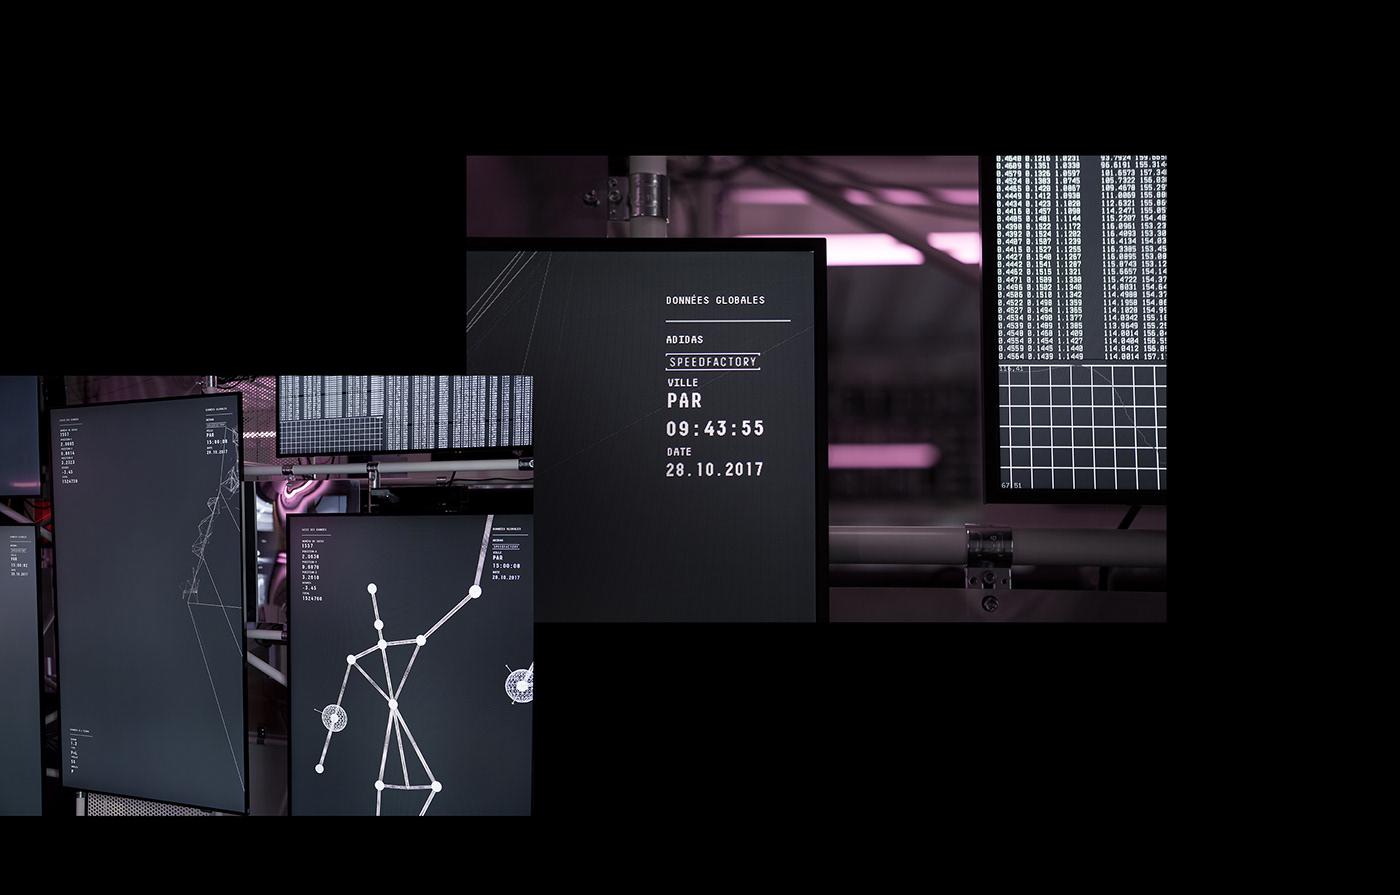 Adidas speedfactory activación 2018 en behance